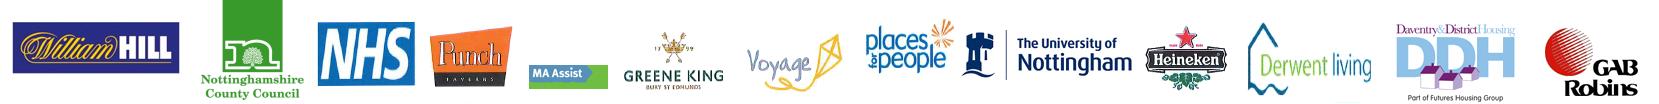 logos_section2